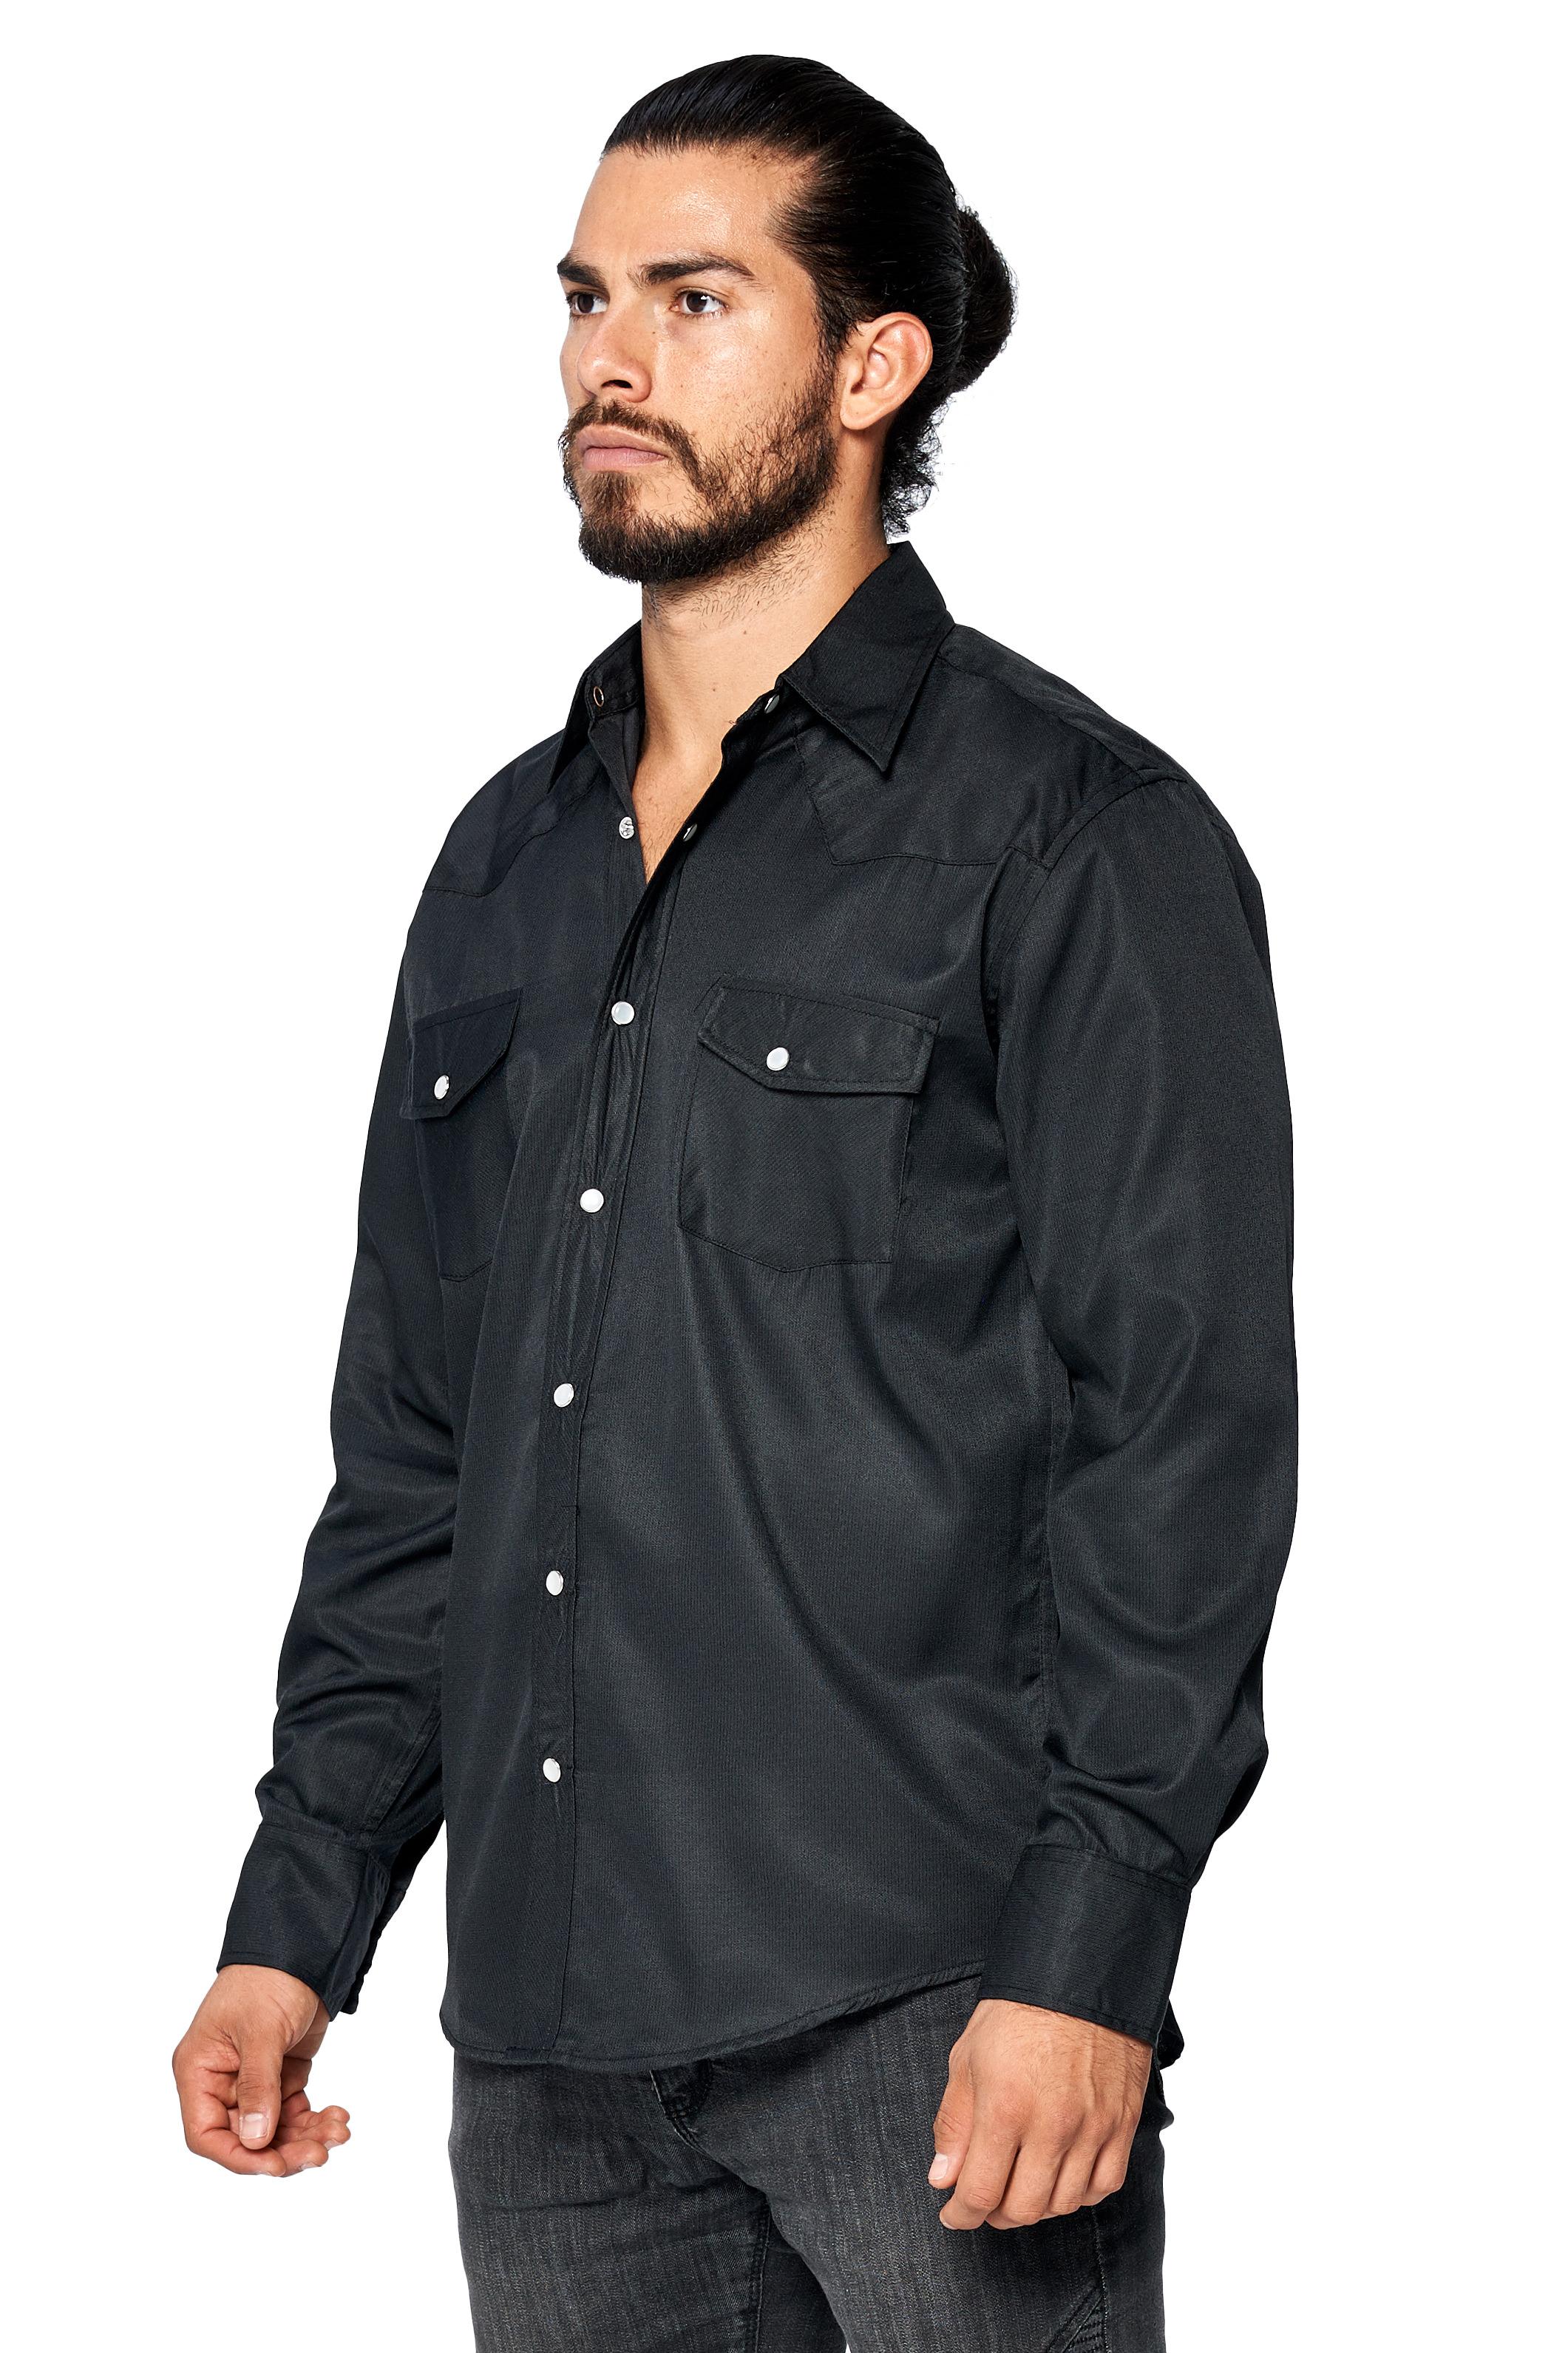 LW-Men-039-s-Pearl-Snap-Tribal-Stylish-Printed-Woven-Western-Vaquero-Rodeo-Shirt thumbnail 52